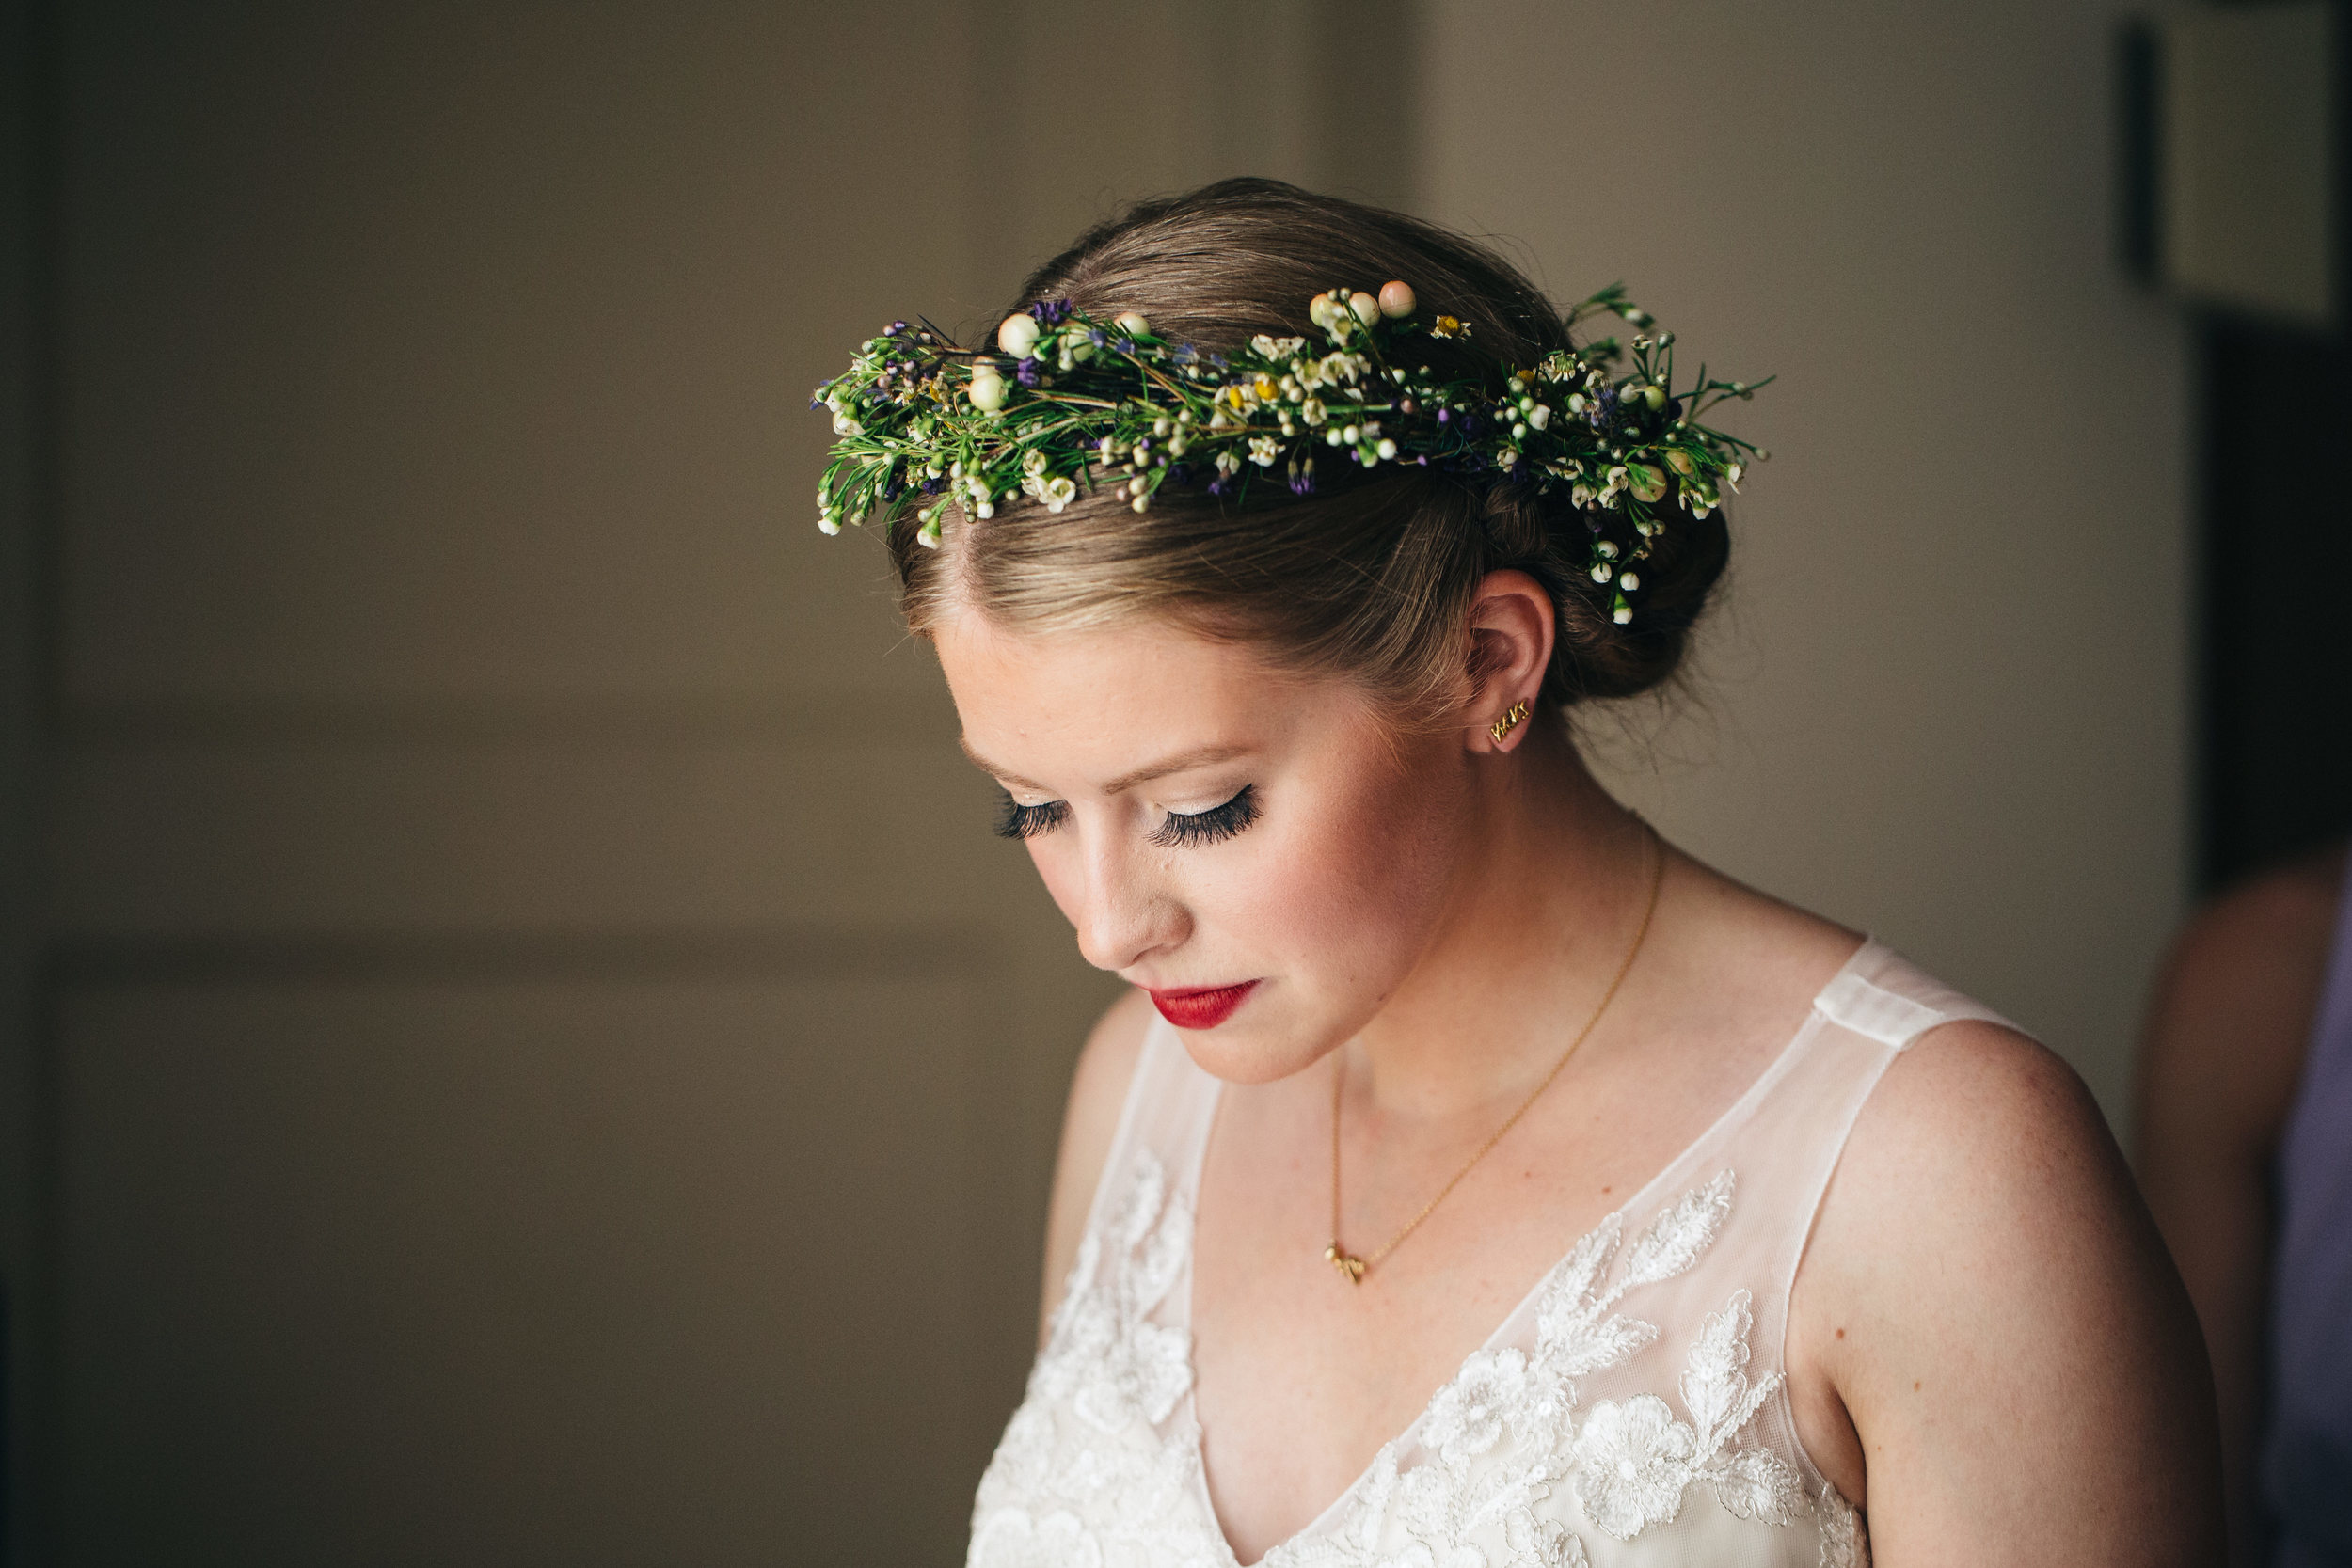 Gorgeous bridal makeup from Reve Salon in Toledo, Ohio.